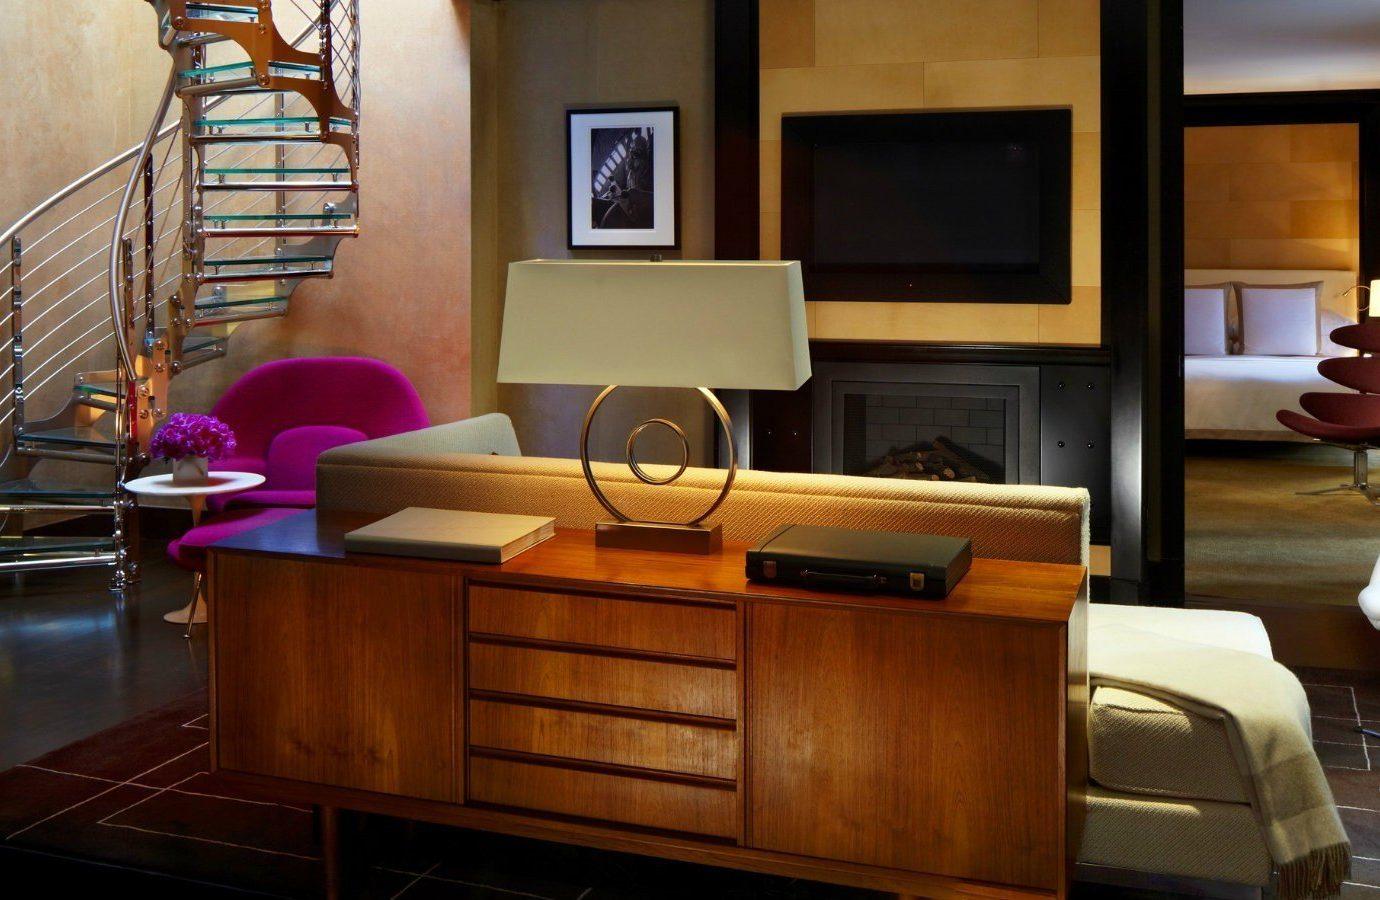 Hotels indoor floor room home living room furniture interior design dining room cabinetry Design wood Suite table